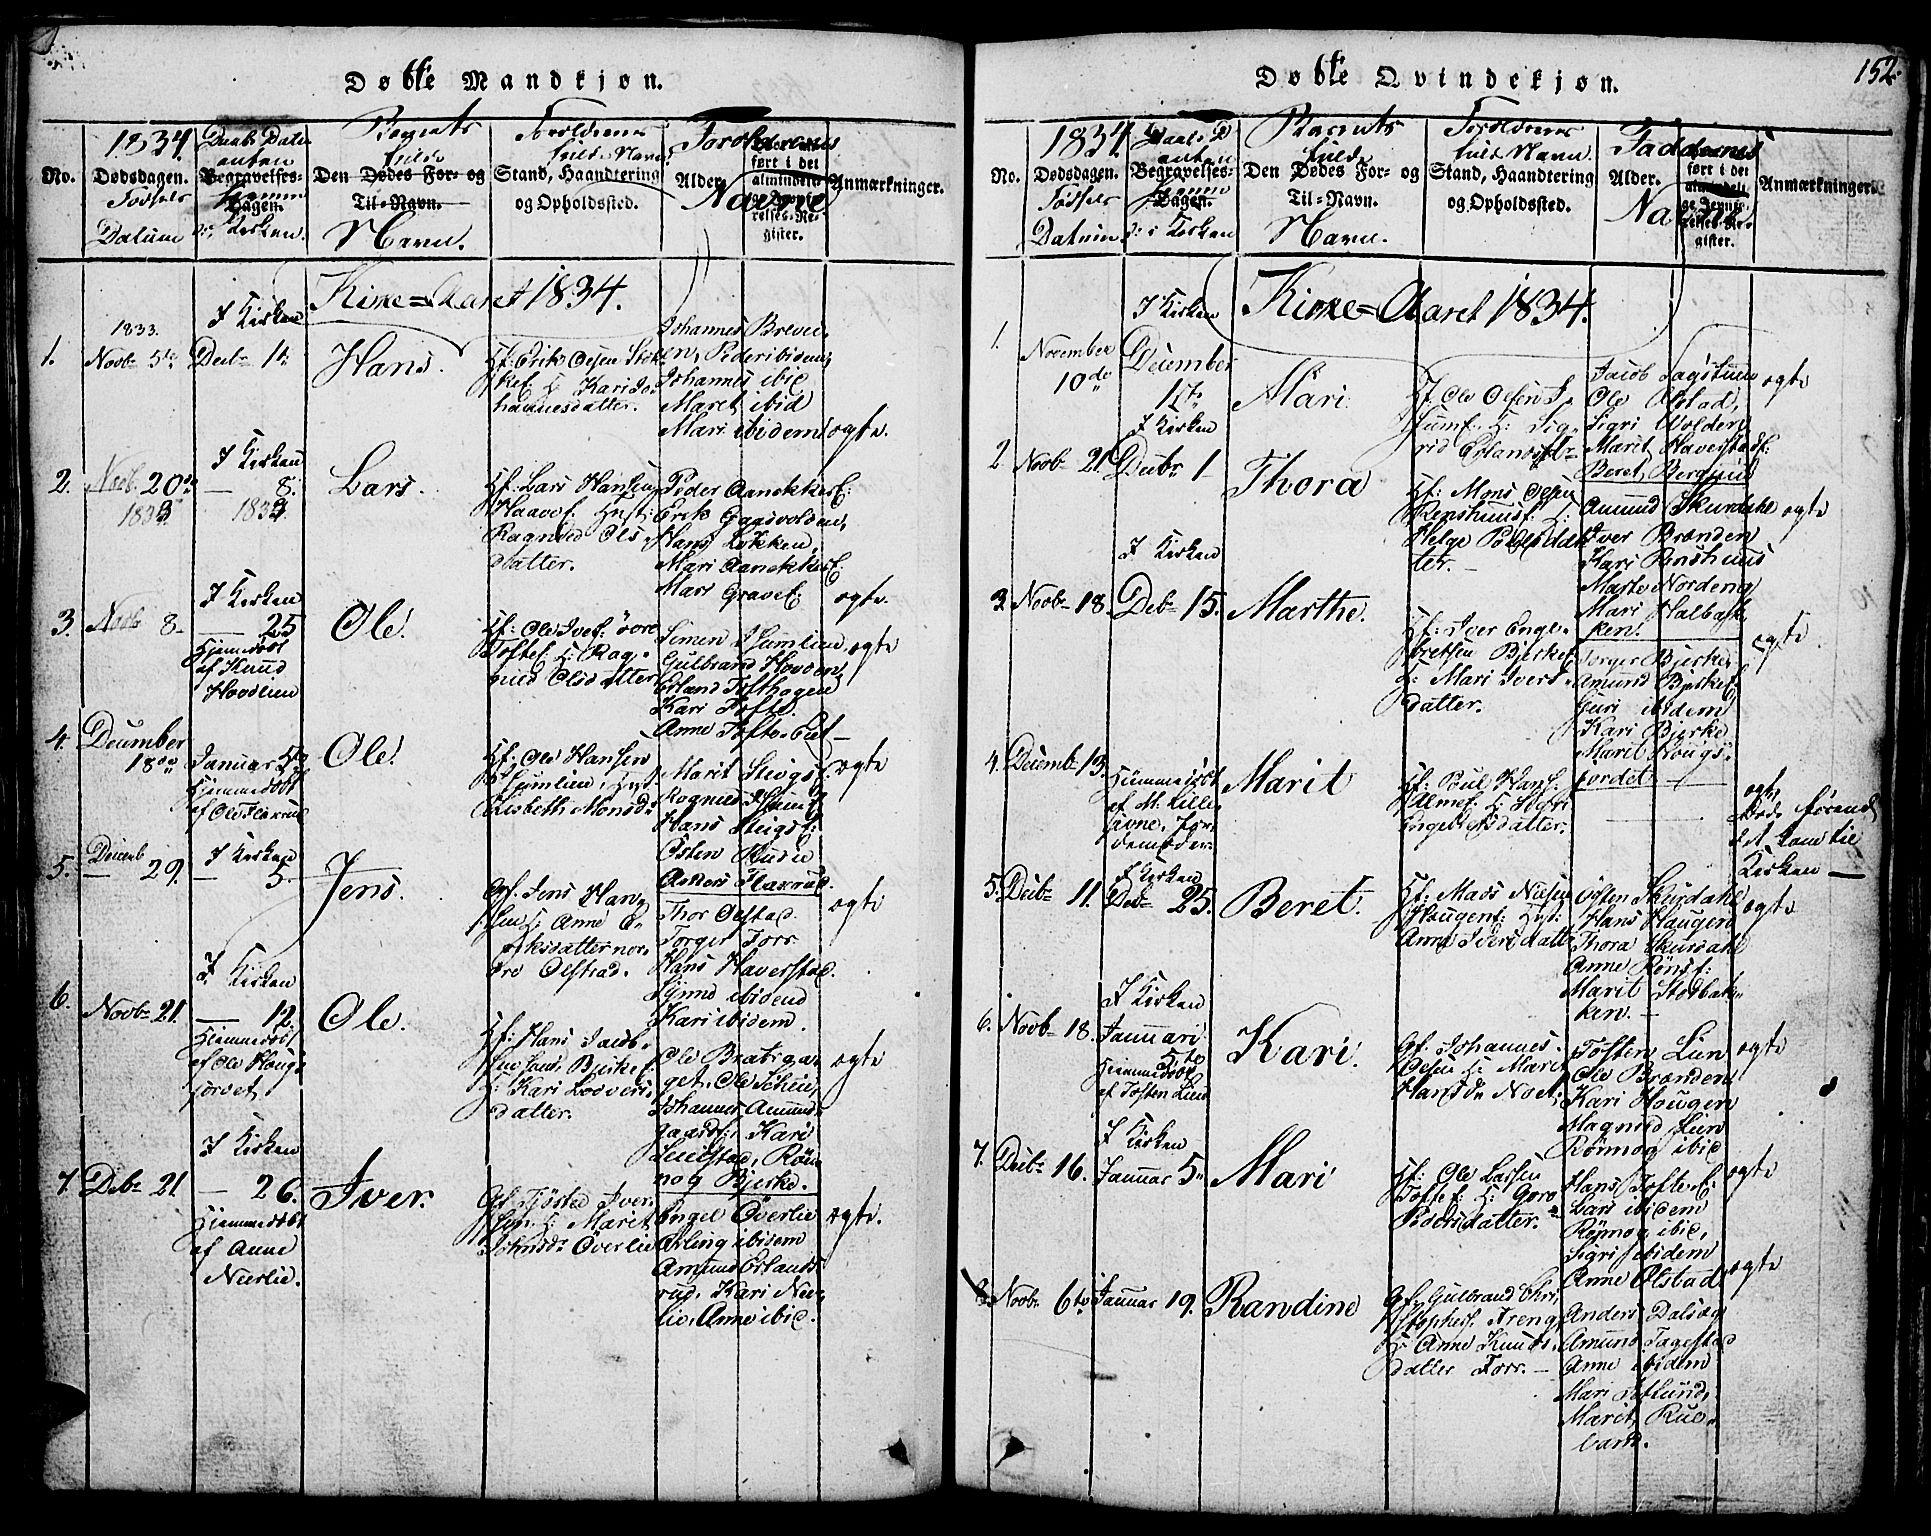 SAH, Fron prestekontor, H/Ha/Hab/L0001: Klokkerbok nr. 1, 1816-1843, s. 152